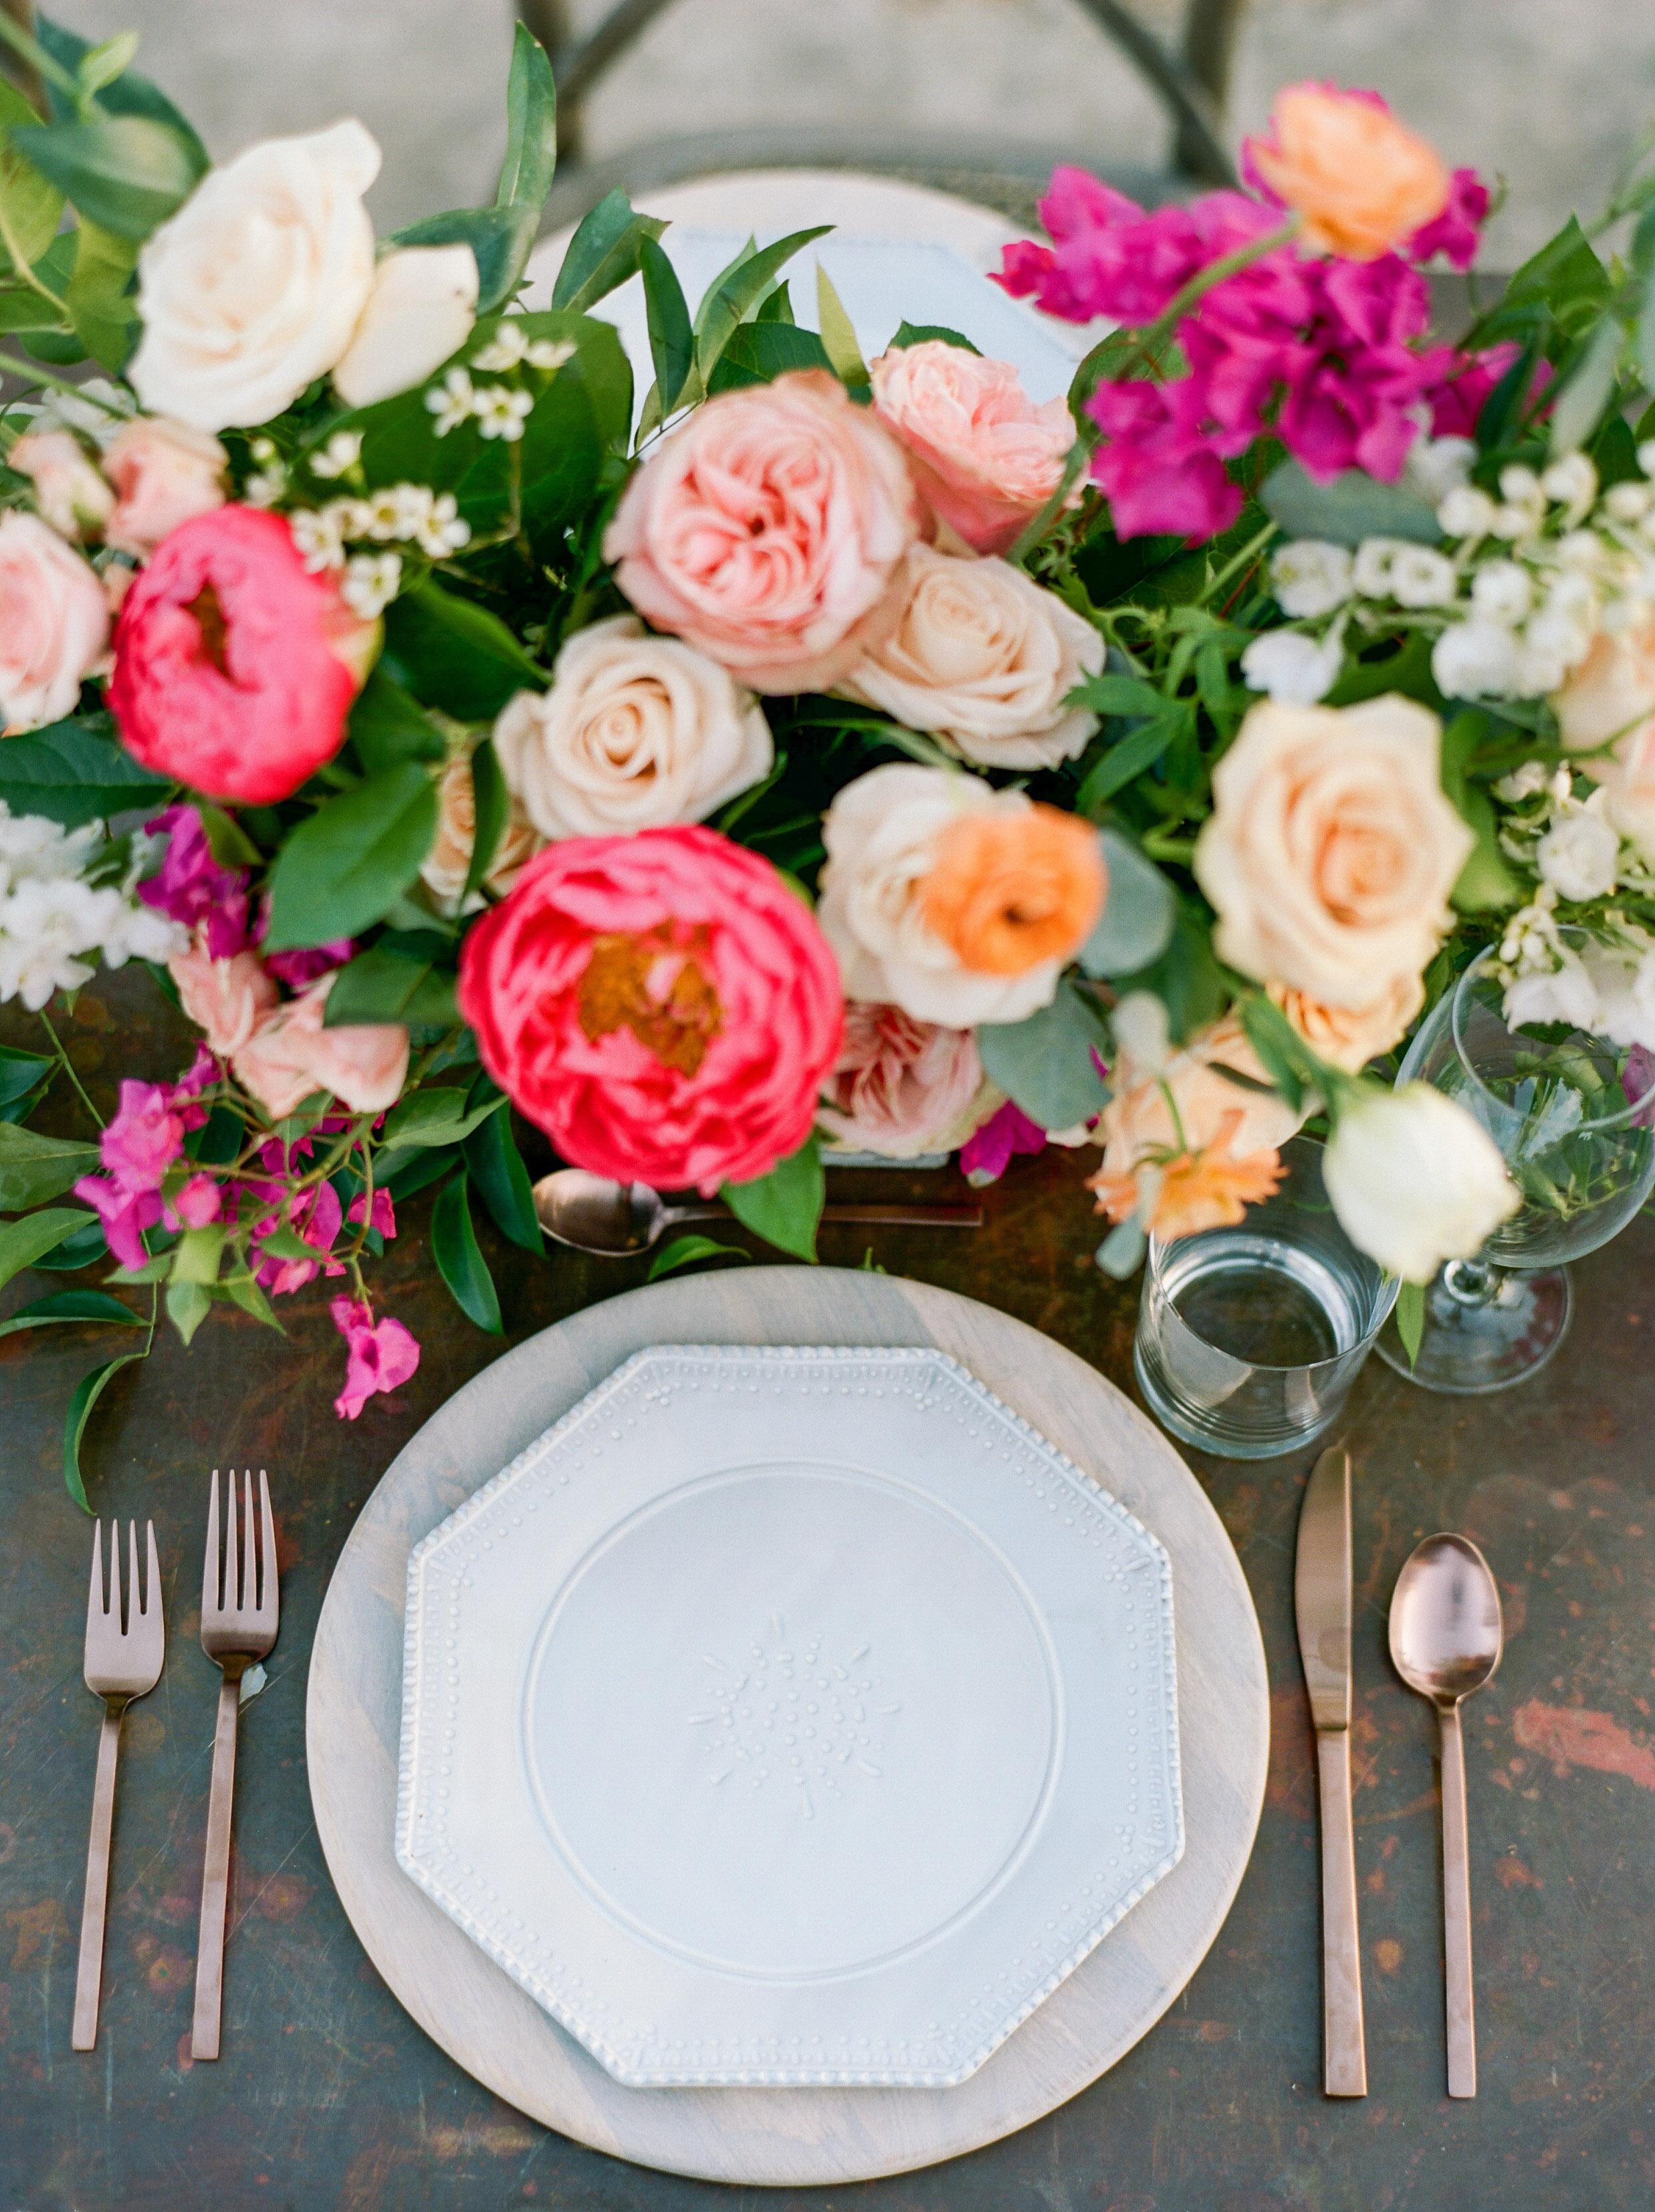 Top-Houston-Wedding-Photographer-Dana-Fernandez-Photography-The-Clubs-At-Houston-Oaks-Country-Club-Belle-Events-Film-Fine-Art-Destination-21.jpg